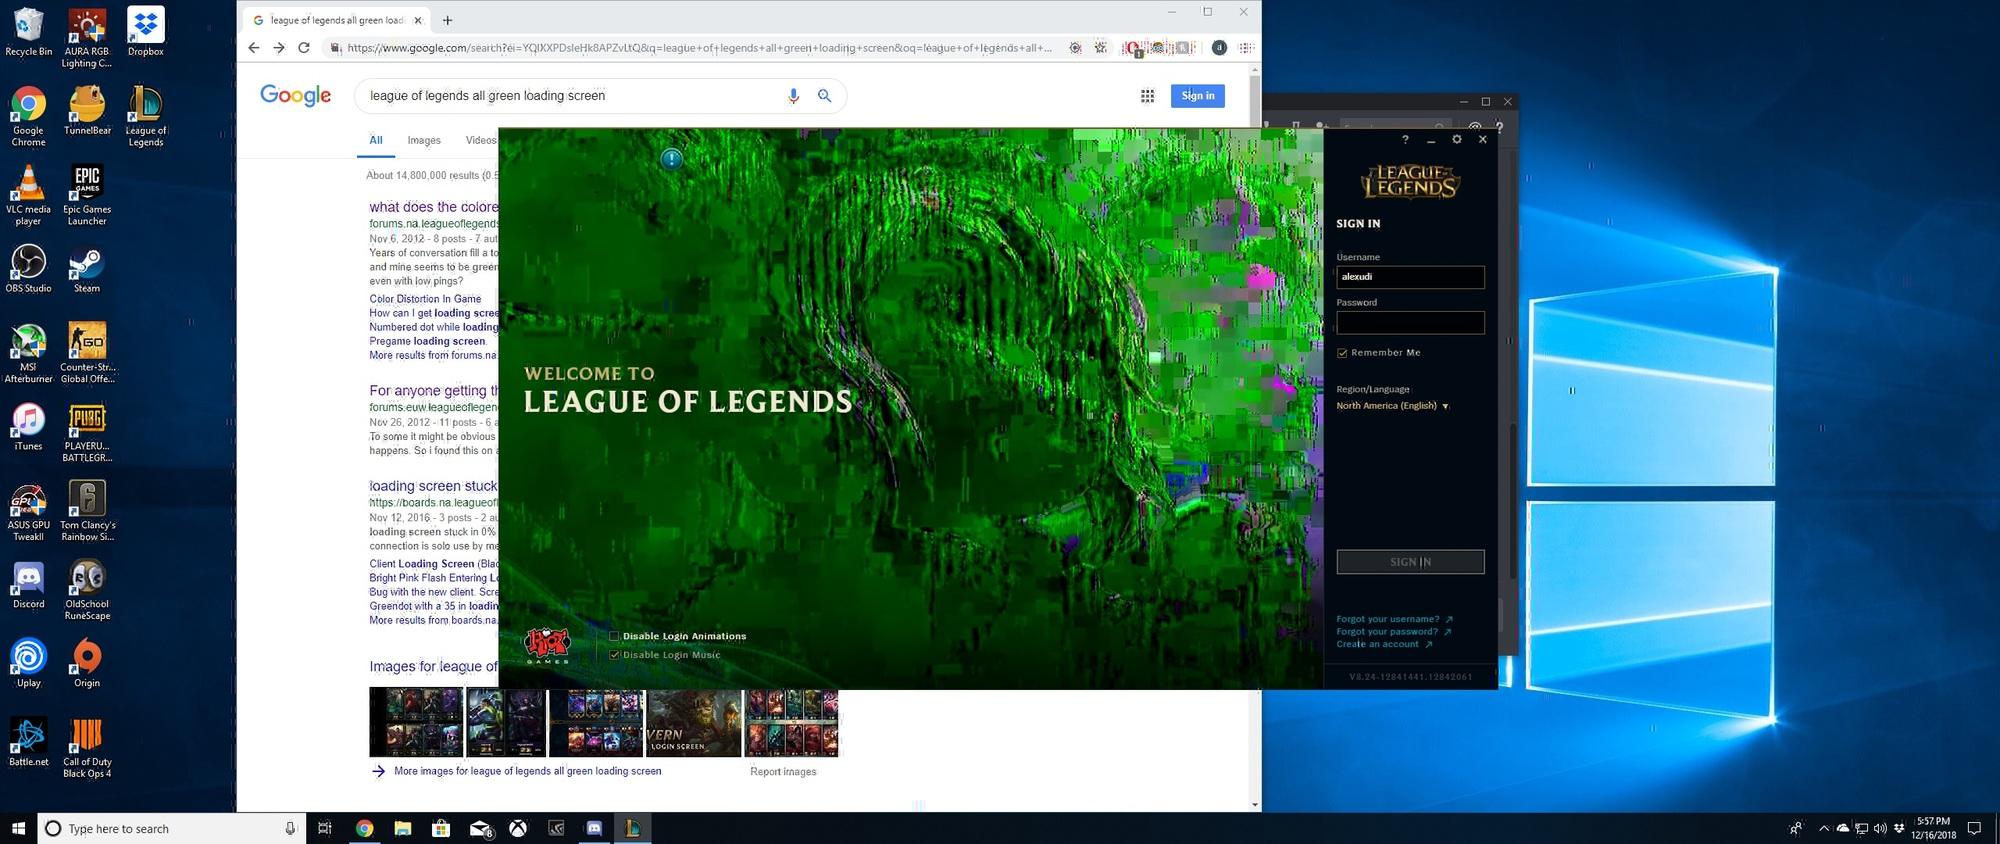 Lines of Green Vertical Pixels Across Desktop Home Screen 17d01559-6f1d-4533-80b7-3c911b200ff9?upload=true.jpg